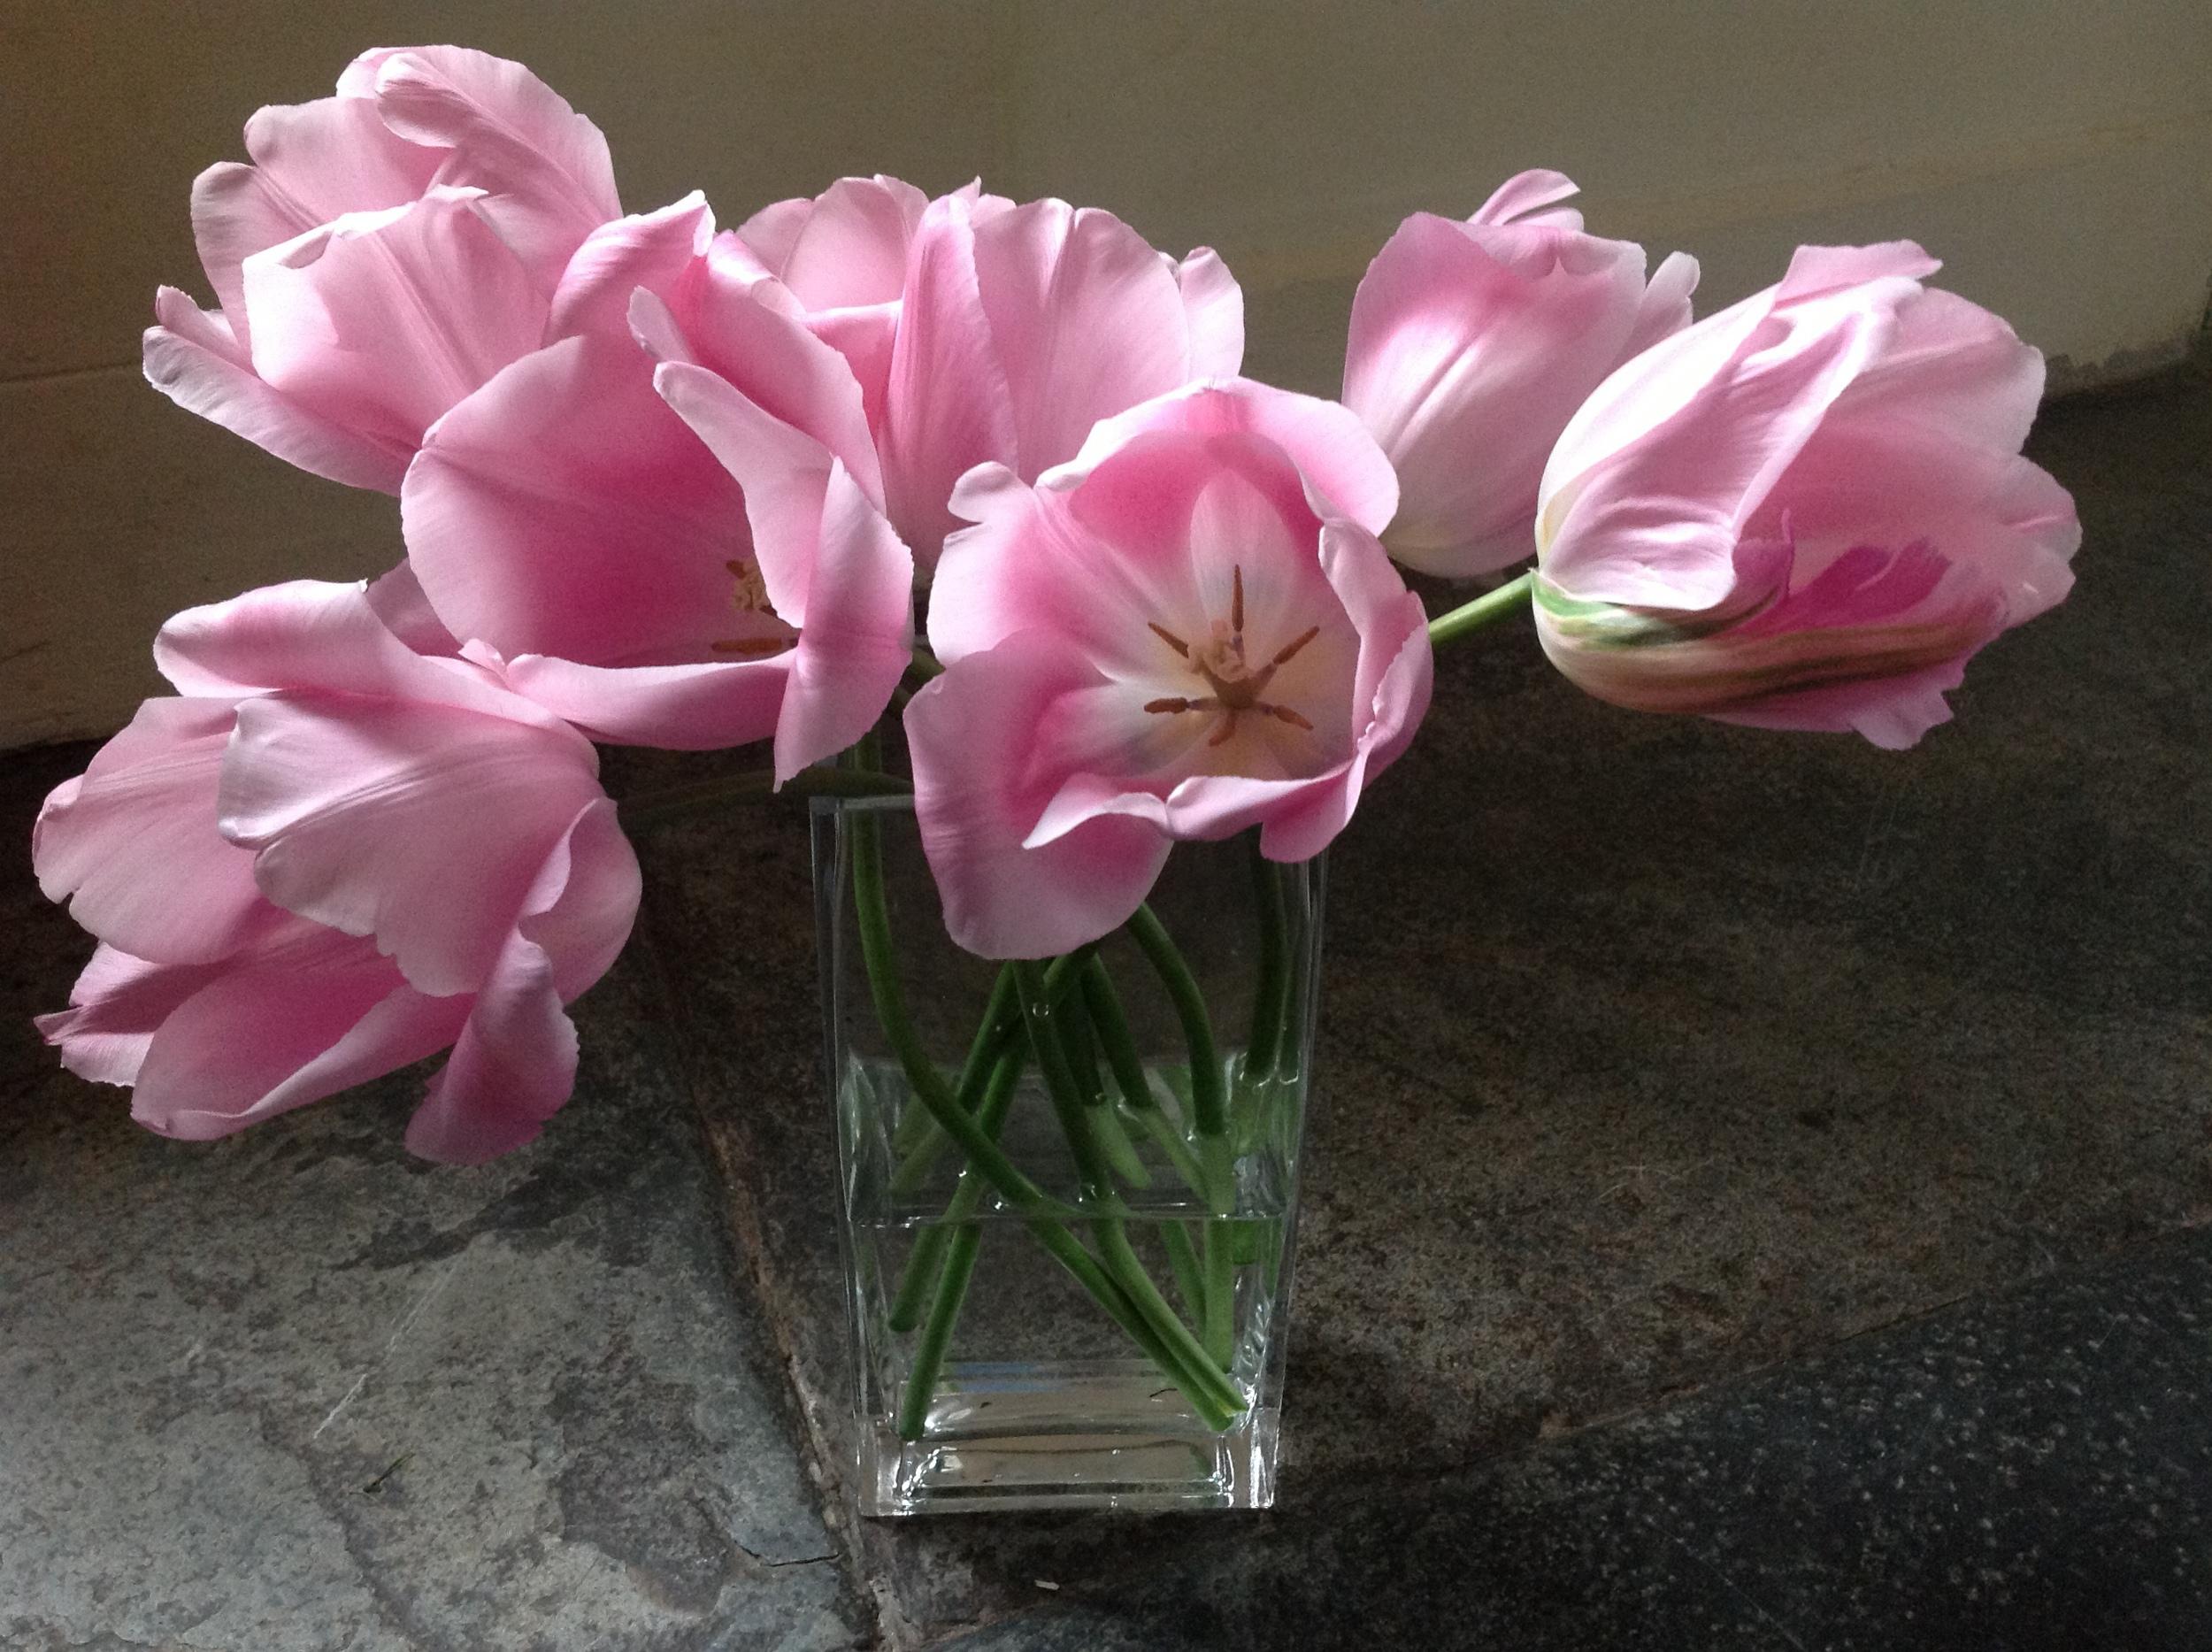 The Garden Gate Flower Company - home grown organic tulips